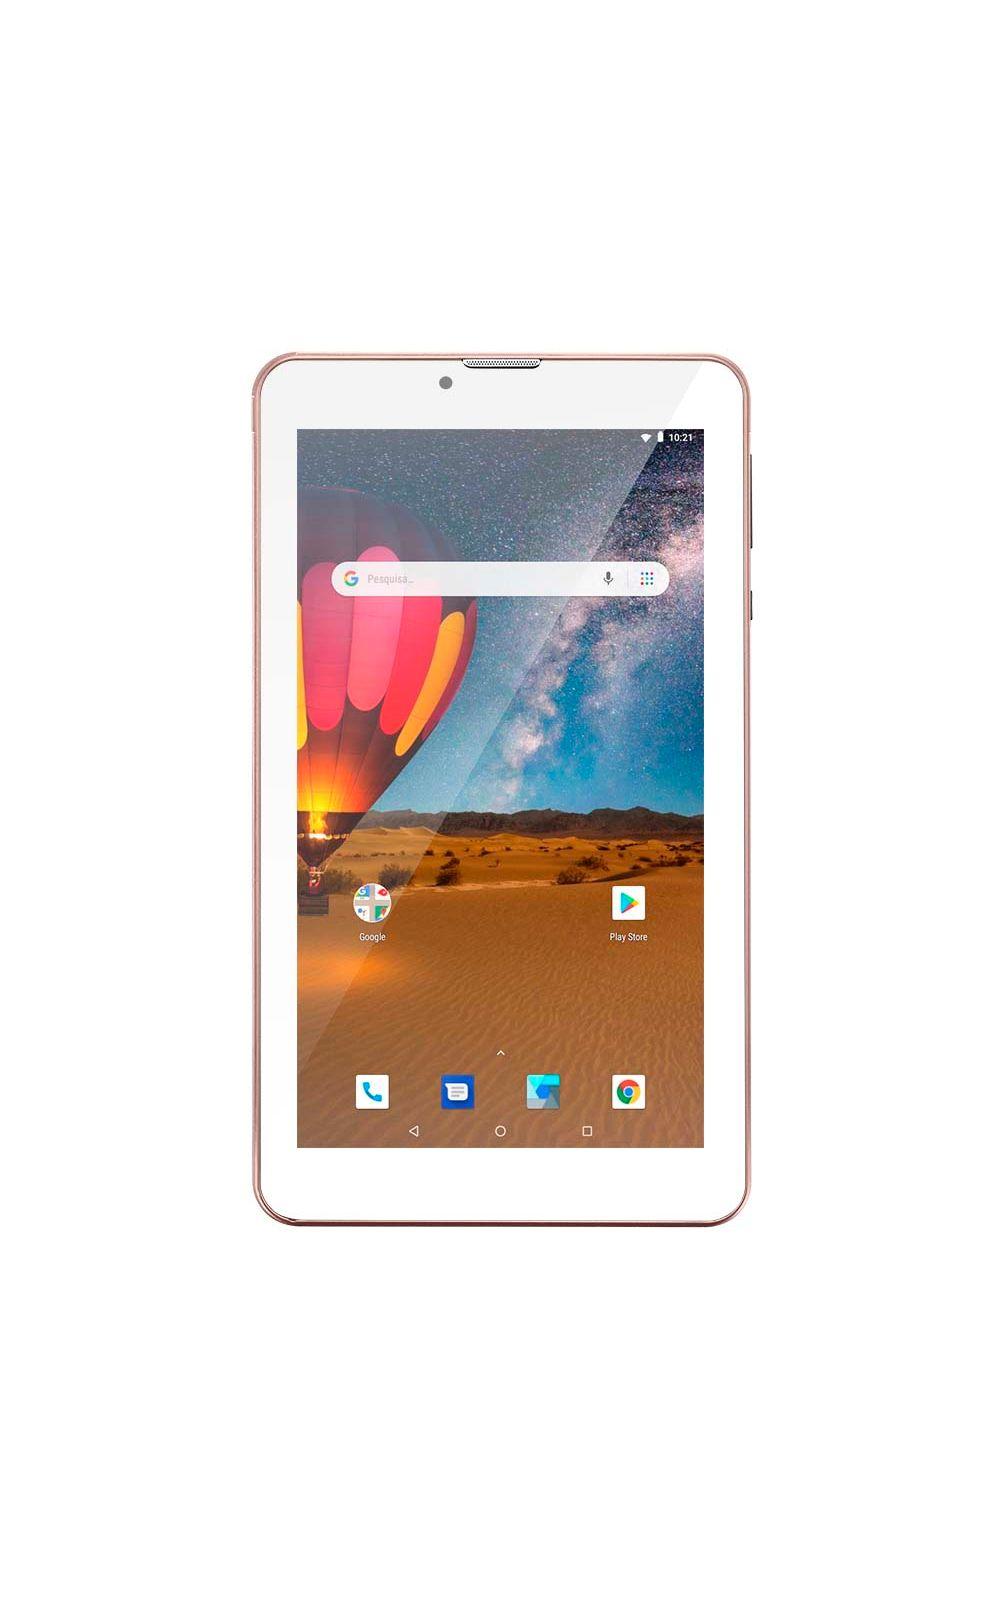 Foto 1 - Tablet Multilaser M7 3G Plus Dual Chip Quad Core 1 GB de Ram Memória 16 GB Tela 7 Polegadas Rosa - NB305